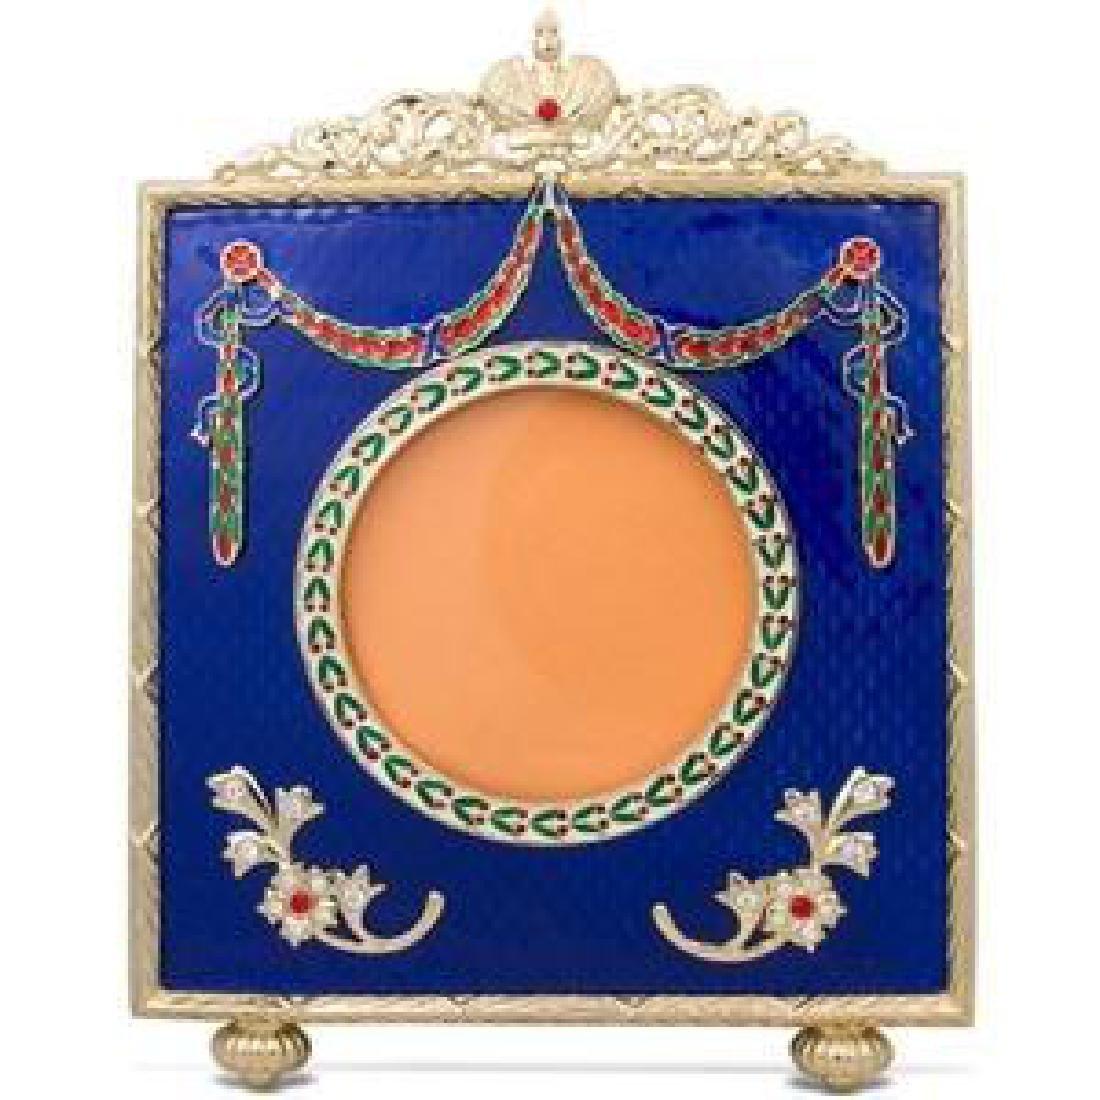 "Faberge Inspired 5"" Faberge Square Blue Enameled"